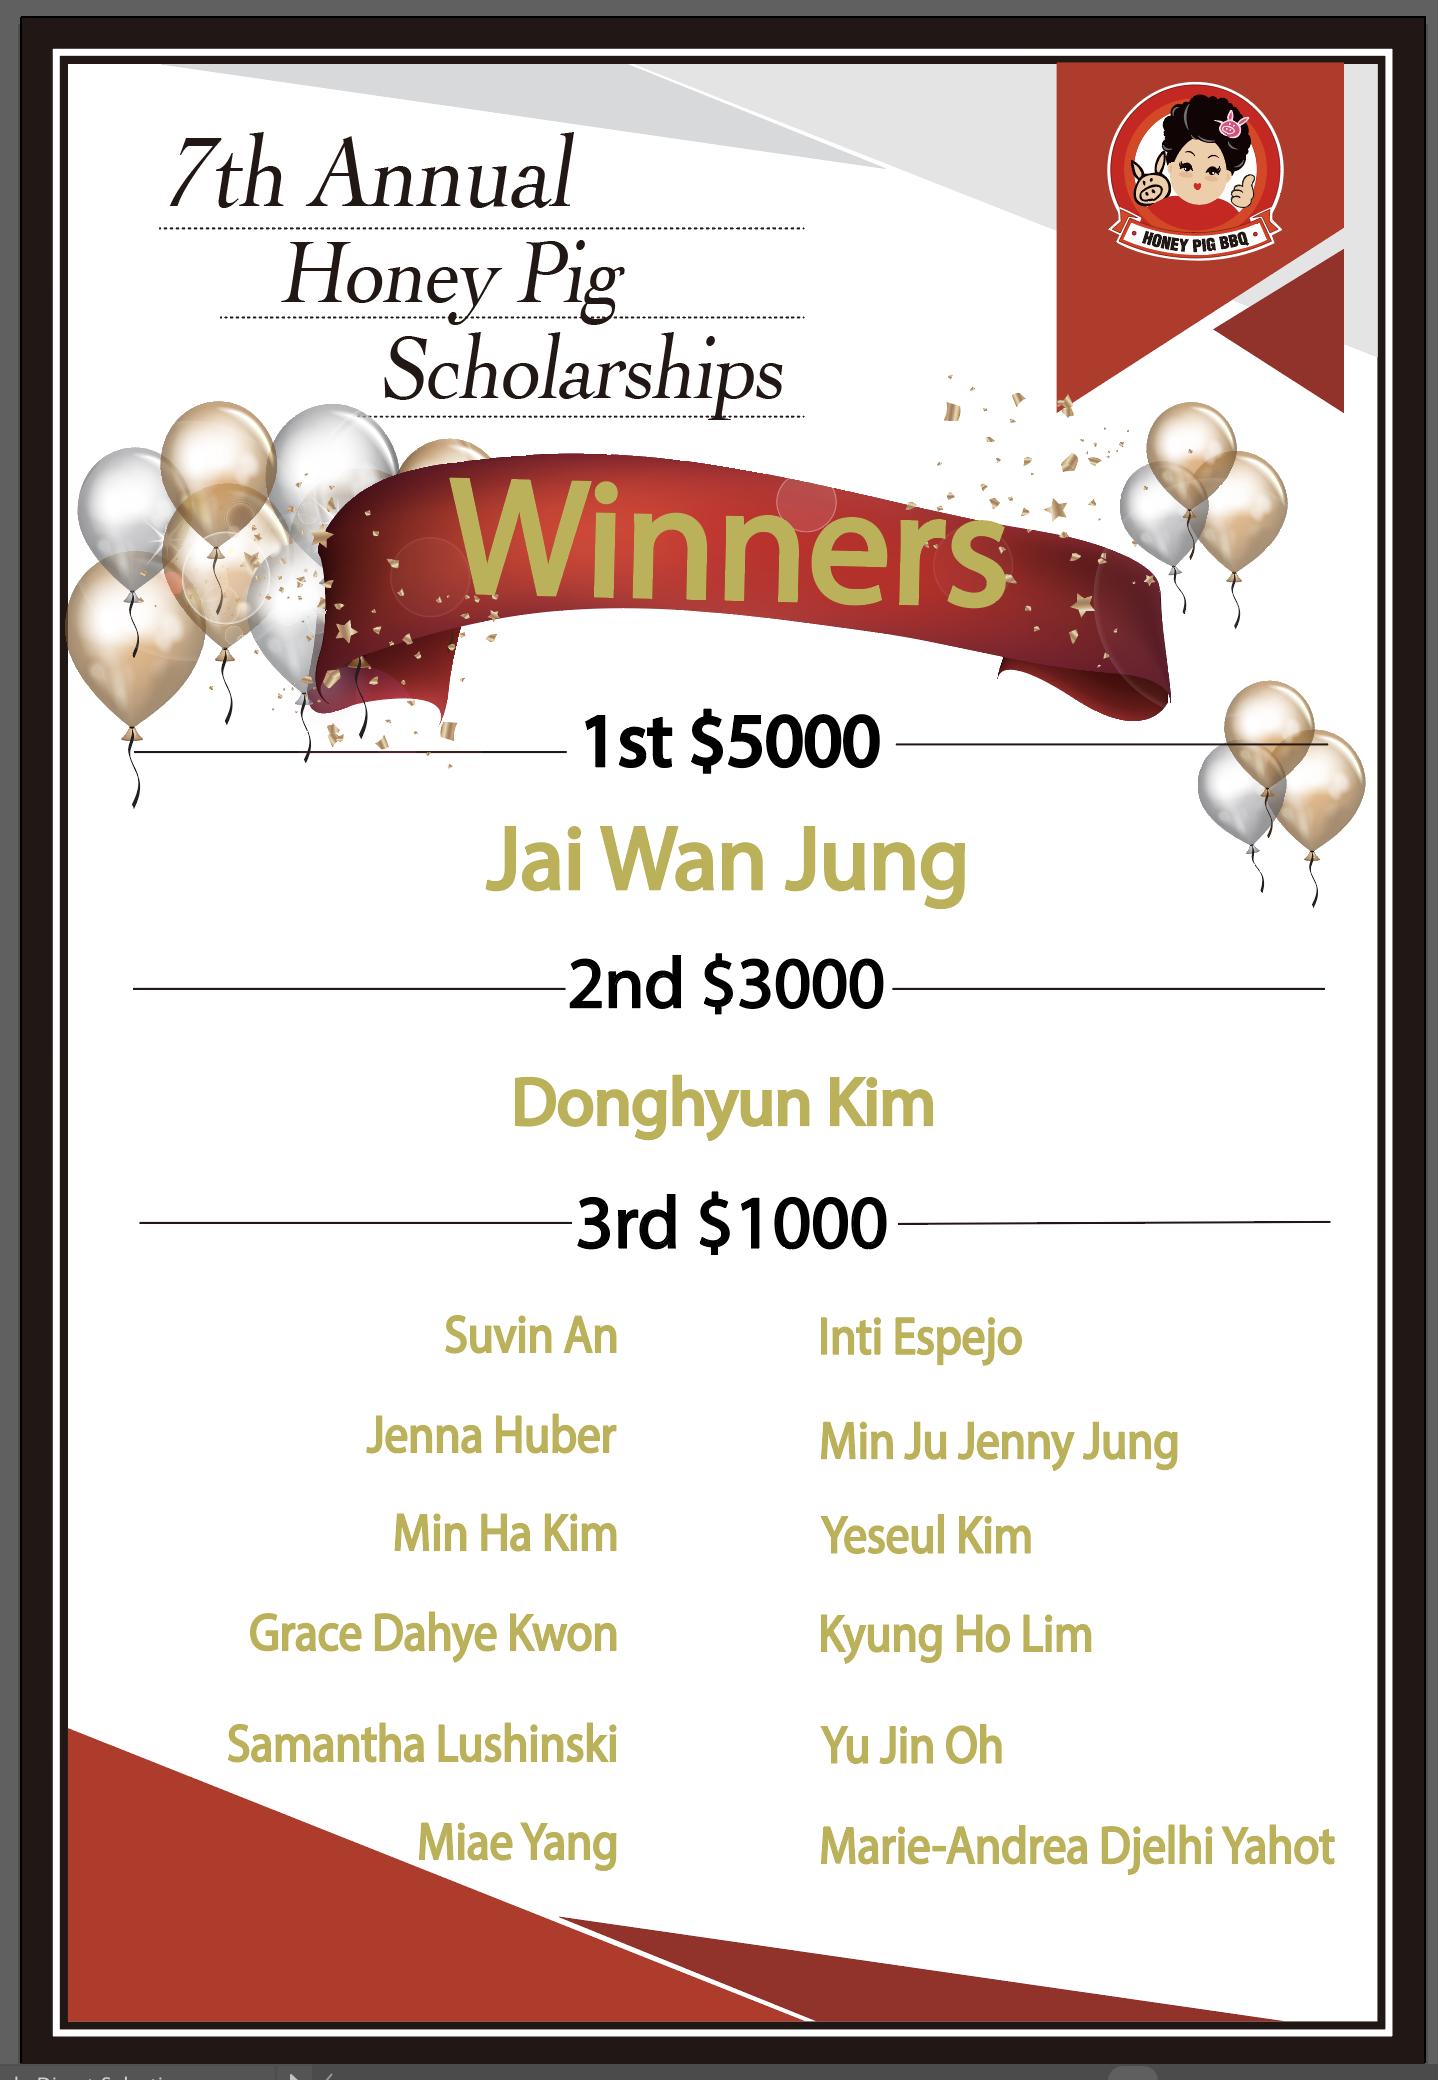 7th annual winners